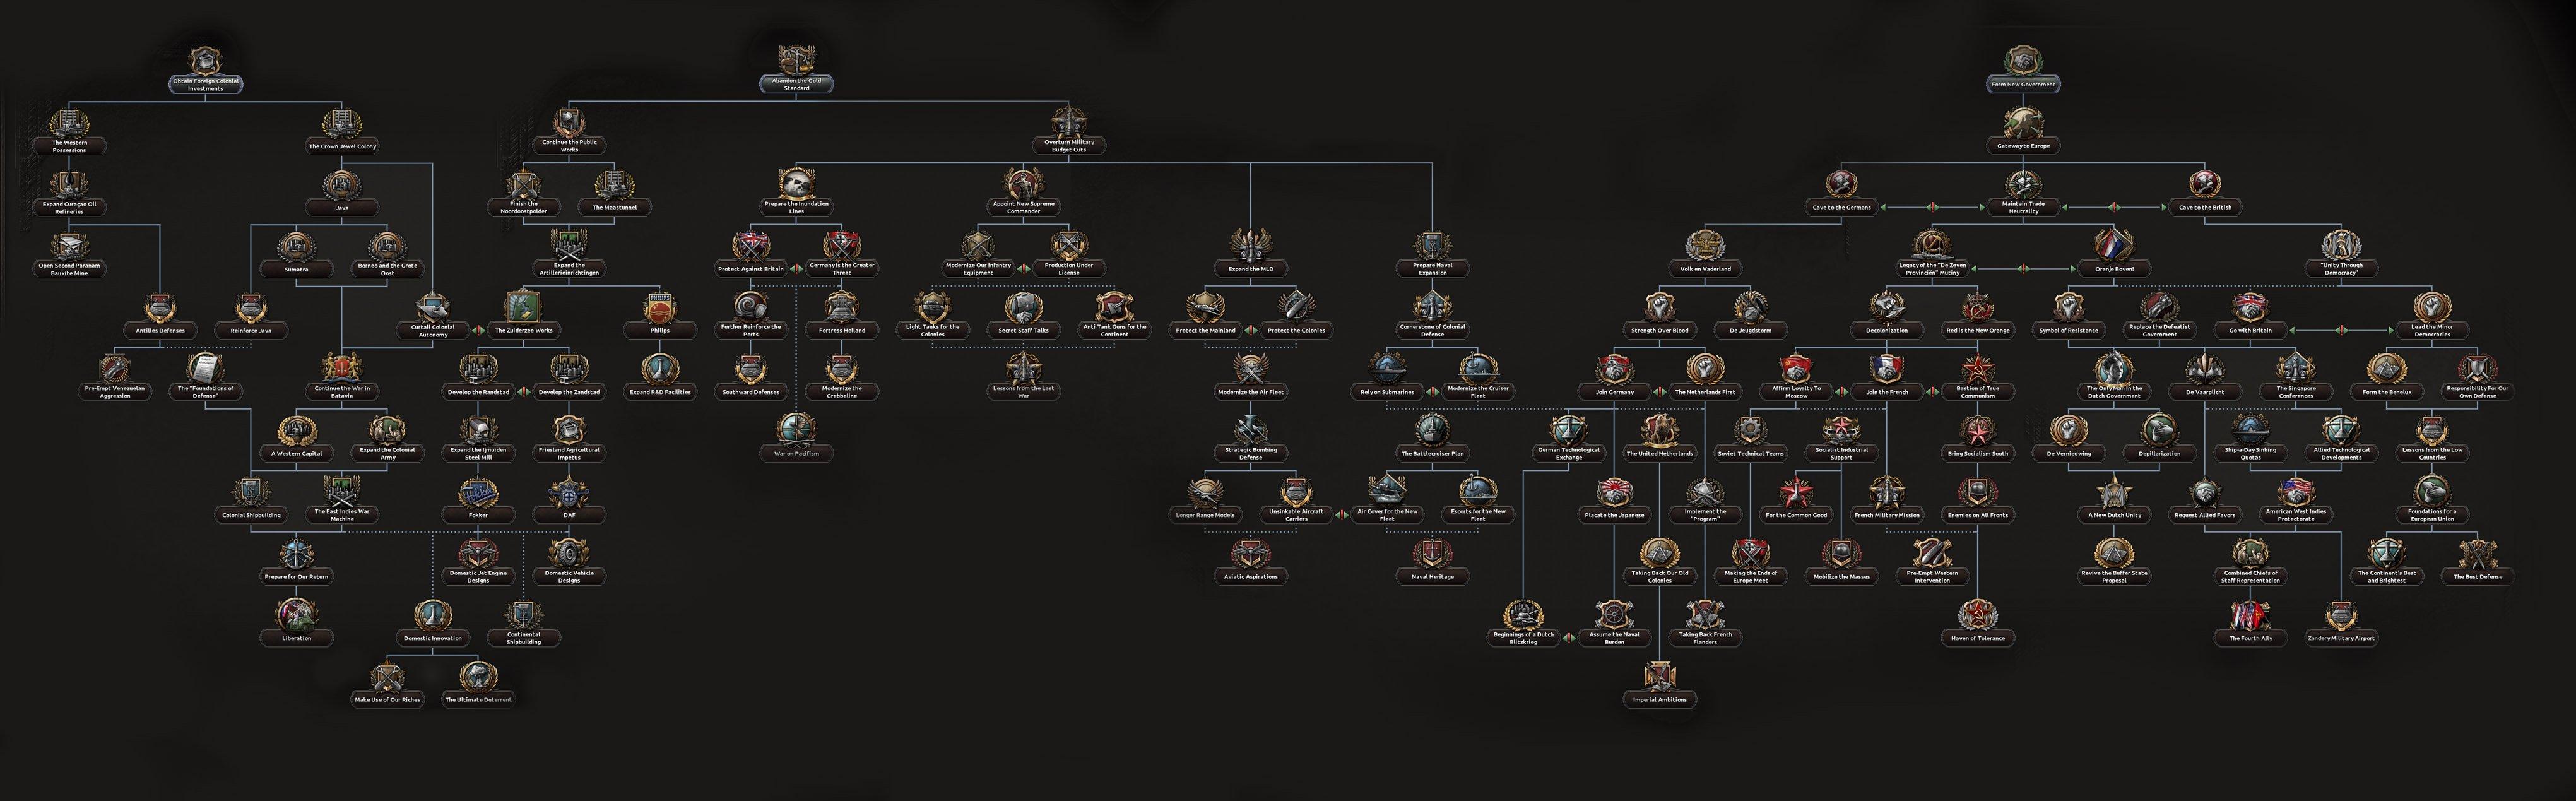 dev_diary_netherlands_tree.jpg